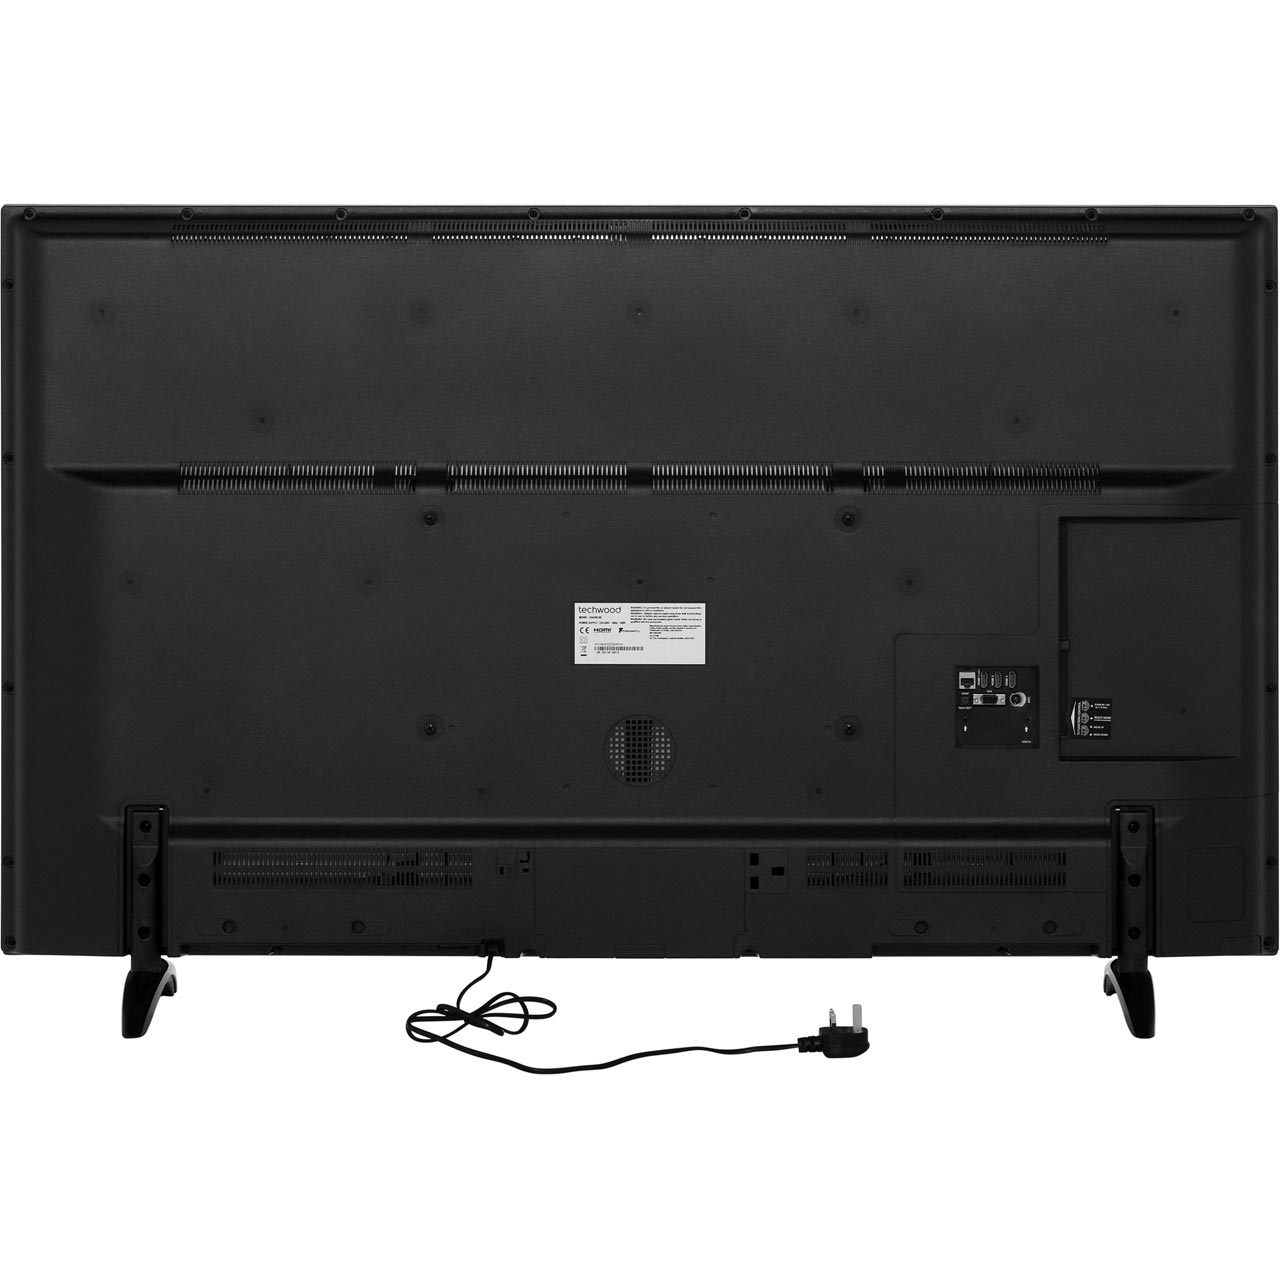 Techwood 55ao6usb 55 Inch 4k Ultra Hd A Smart Led Tv 3